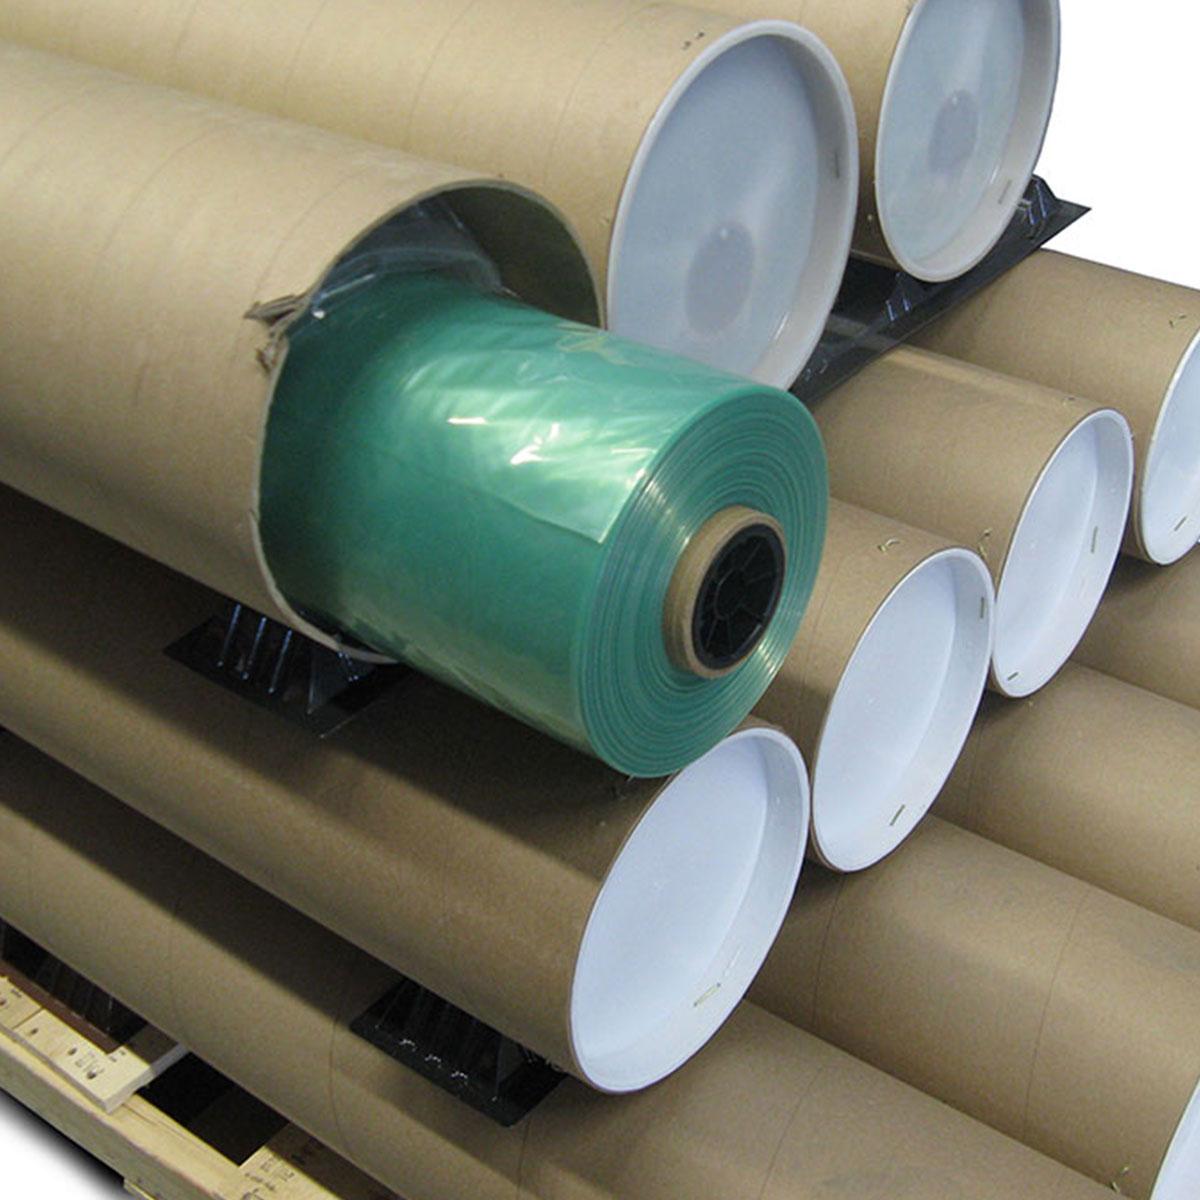 vacuum bag nylon 1370 green sht 0076mm x 1370mm 3014m 0003 x 54